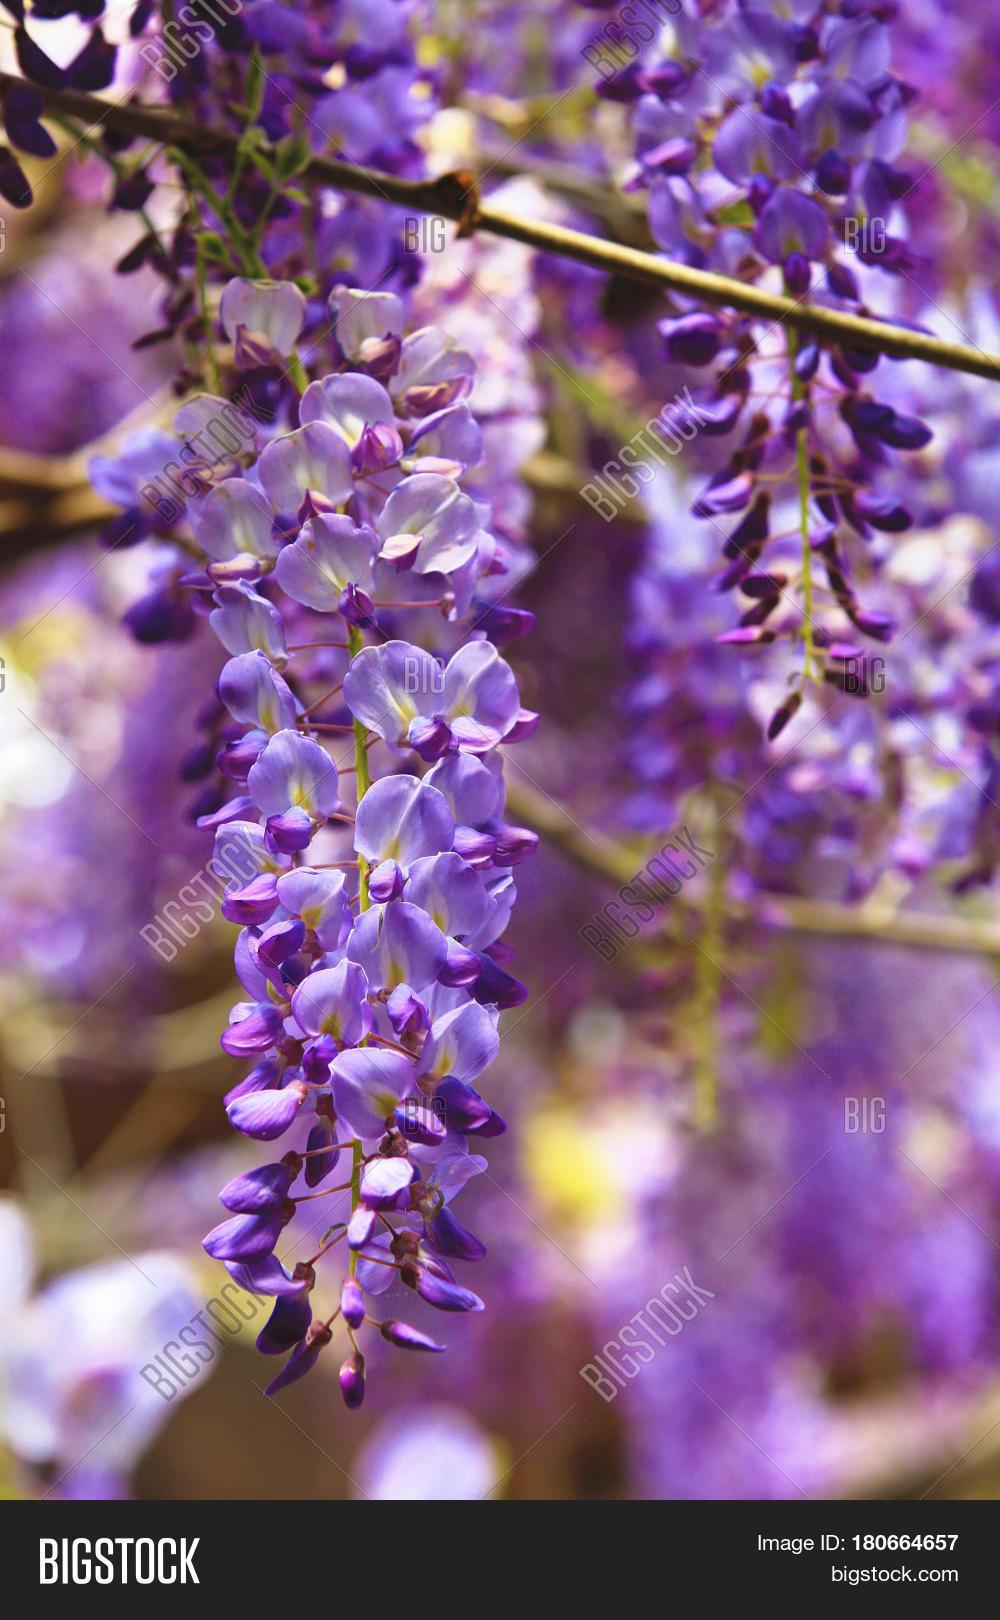 Purple wisteria image photo free trial bigstock purple wisteria flowersbeautiful scenery of purple with yellow flowers and buds blooming in the izmirmasajfo